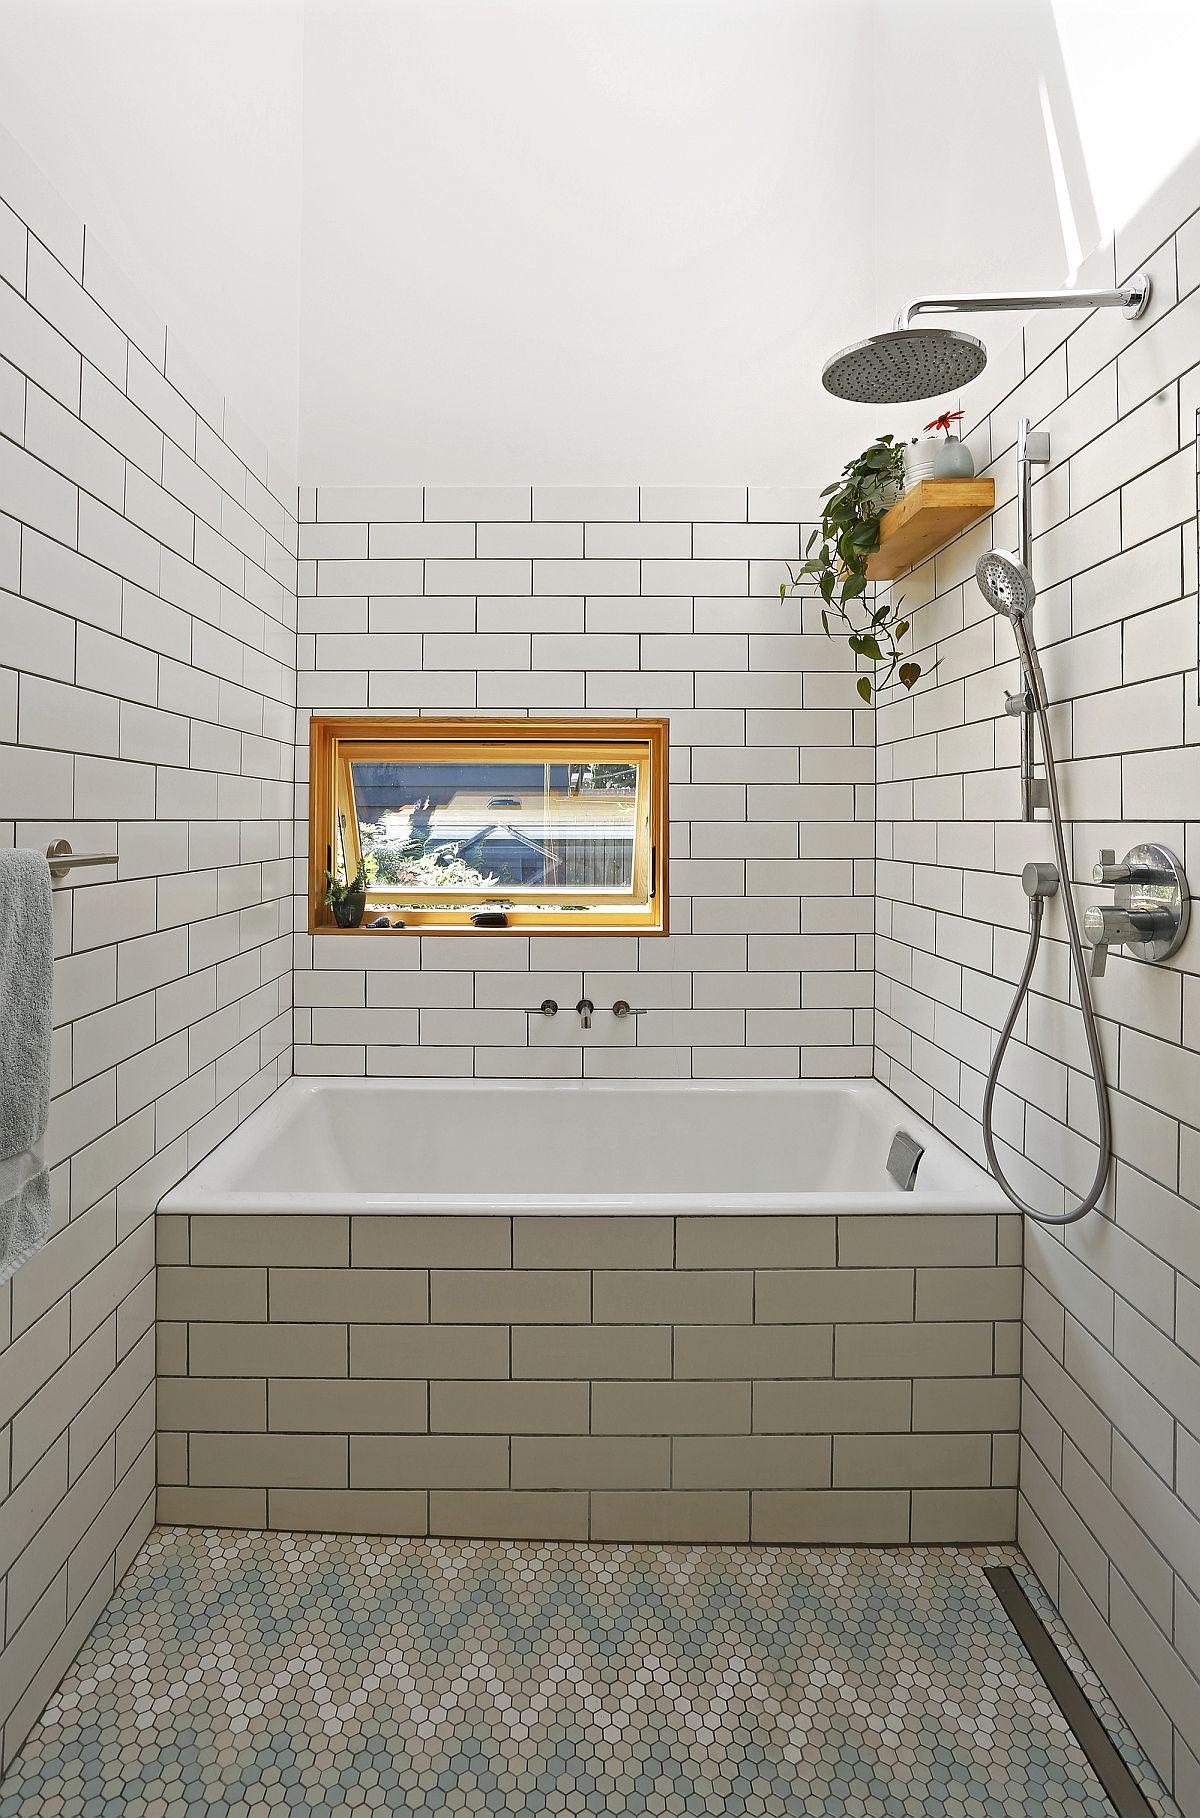 Interesting use of chevron pattern tile for the bathroom floor